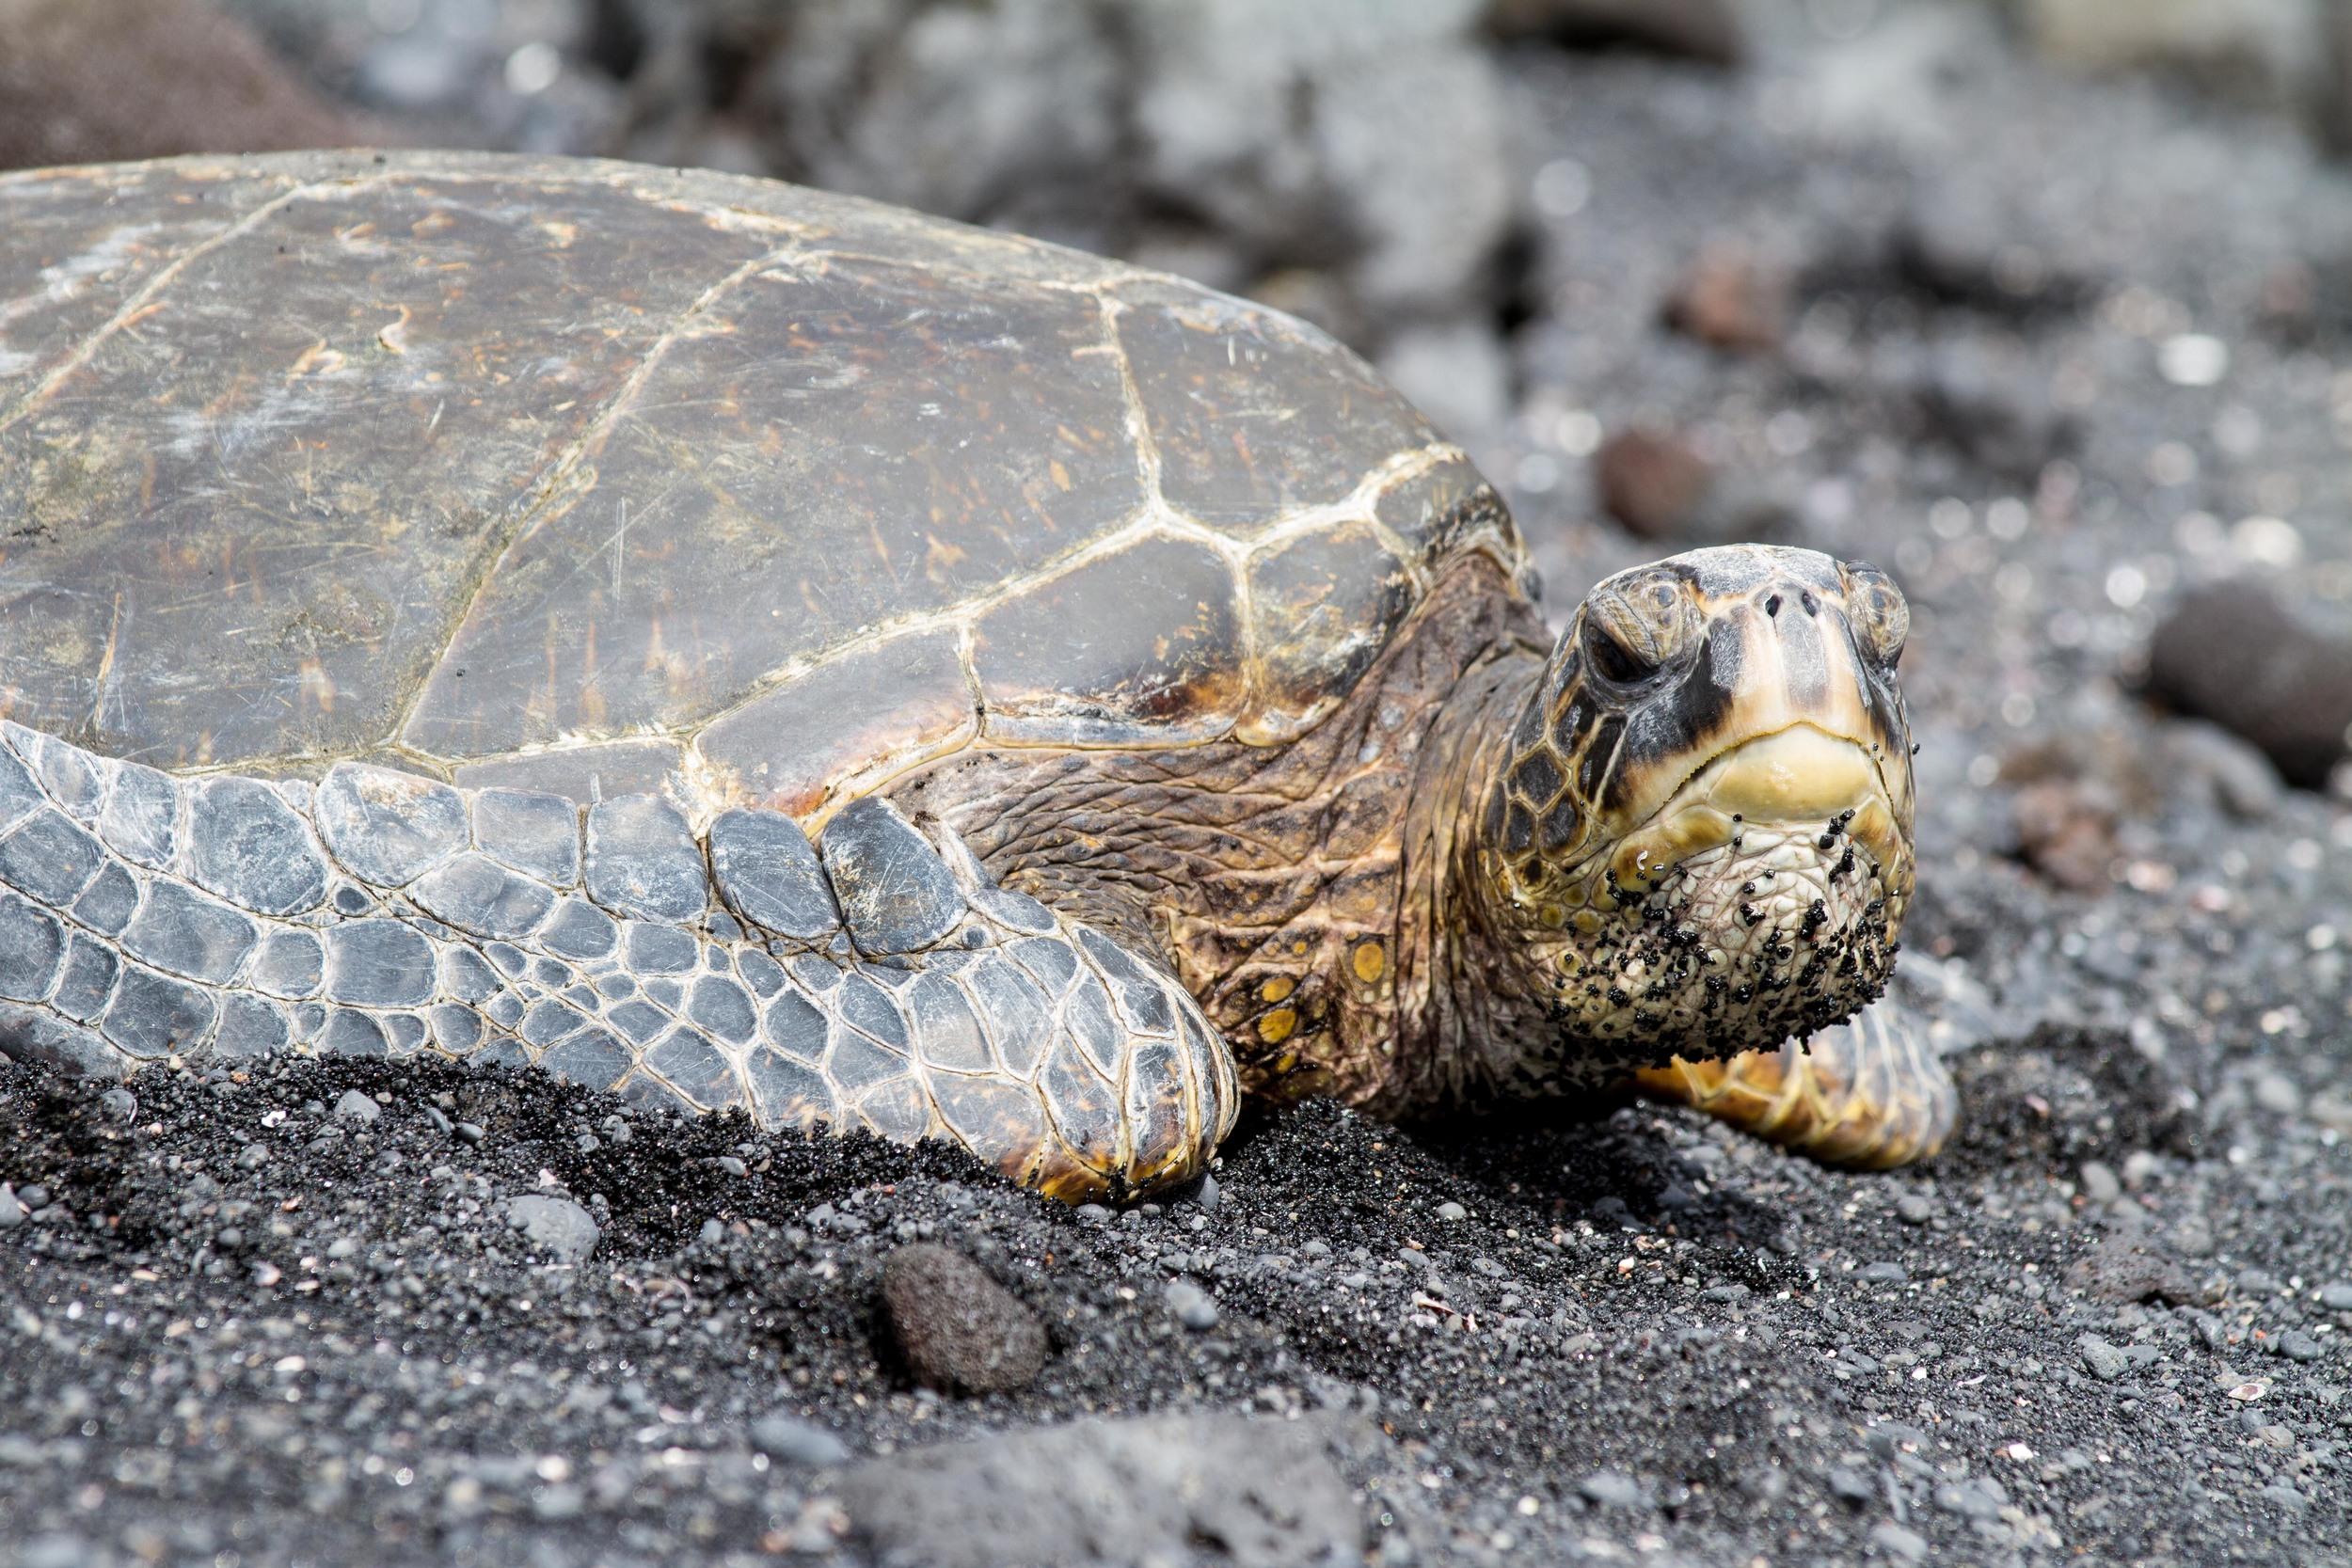 A Green Sea Turtle on a black sand beach. VERY hot sand!